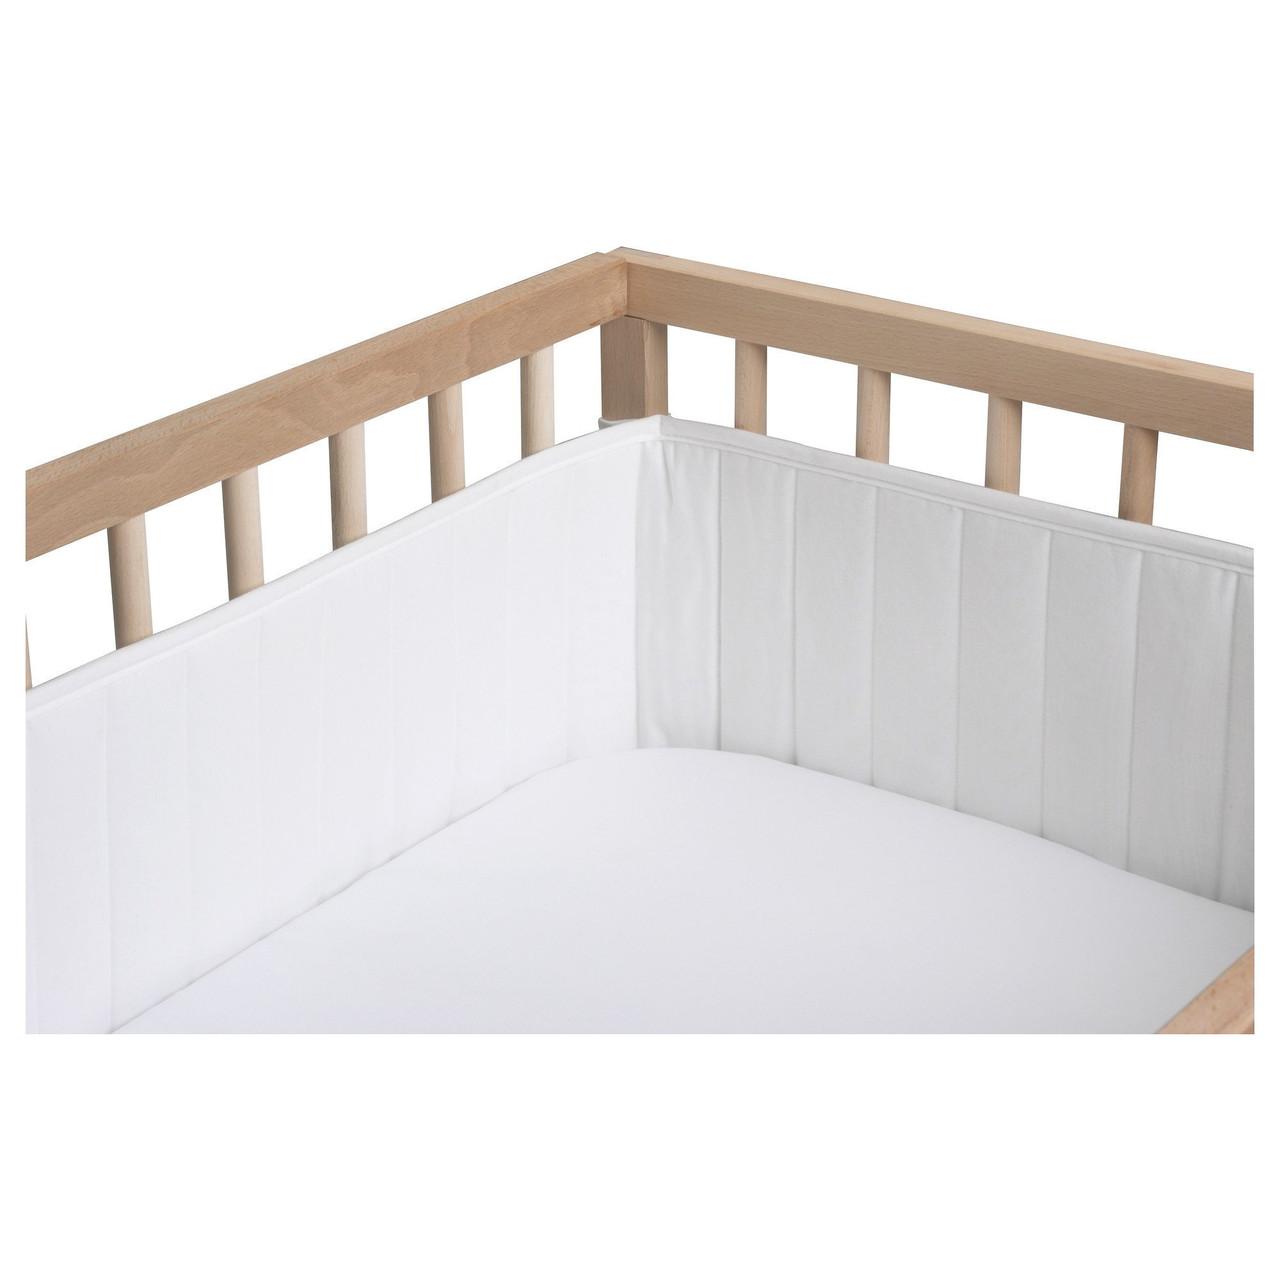 КОМПИСАР Мягкий бортик, белый, 374x21 см, 30113939, ИКЕА, IKEA, KOMPISAR